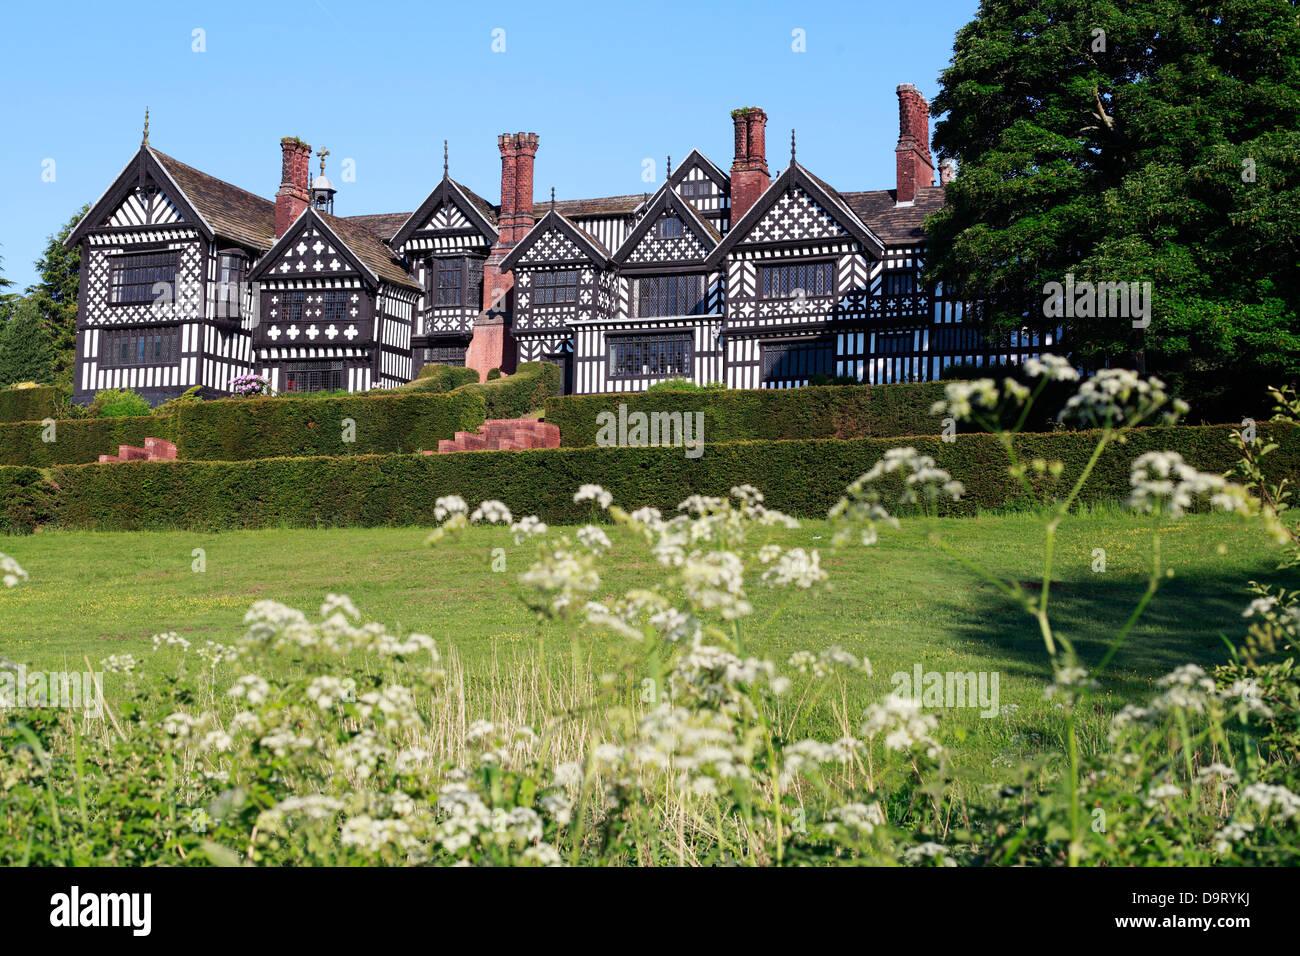 Bramhall Hall A Tudor Timber Framed Country House In Bramhall Stockport Cheshire England Stock Photo